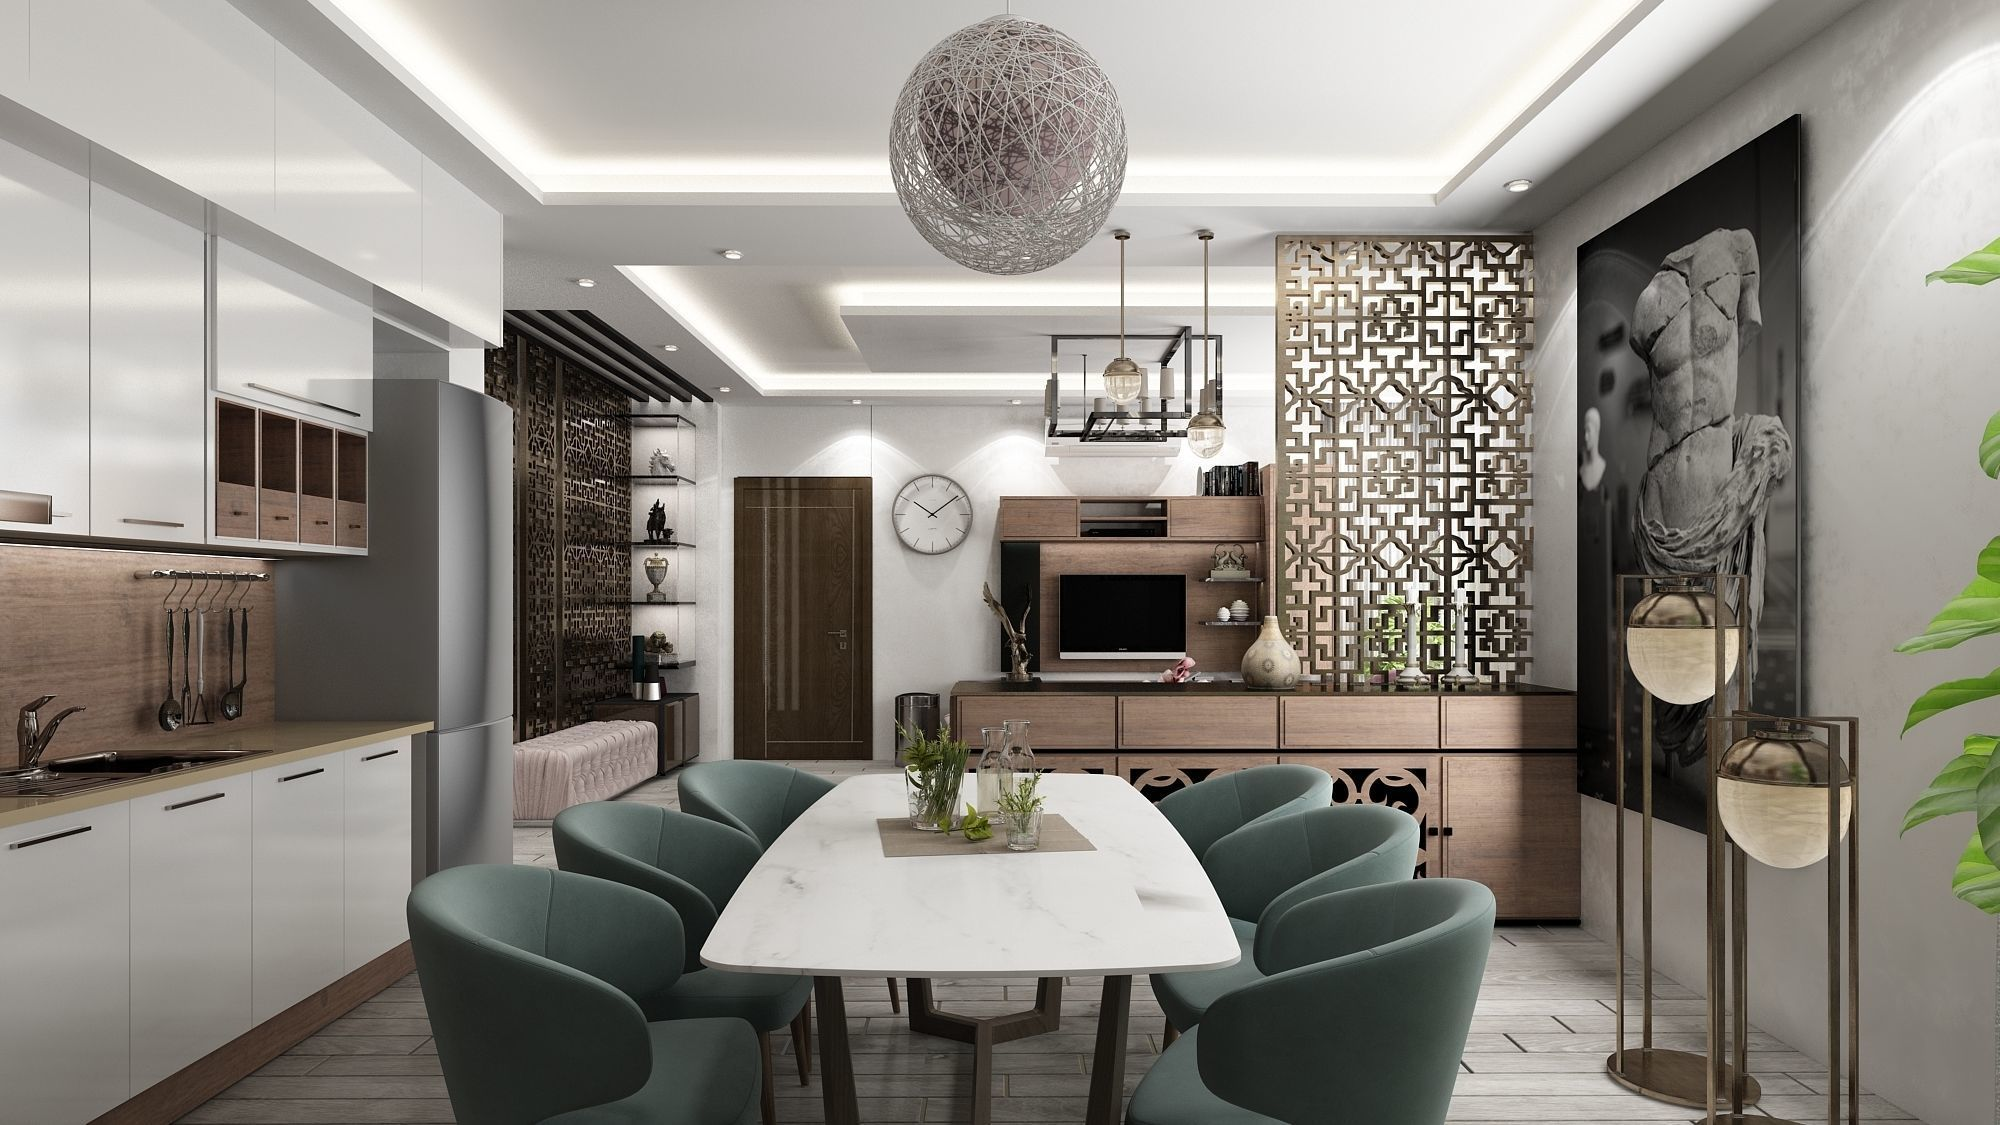 Full detailed Living room hall with kitchen interior scene | 9D model